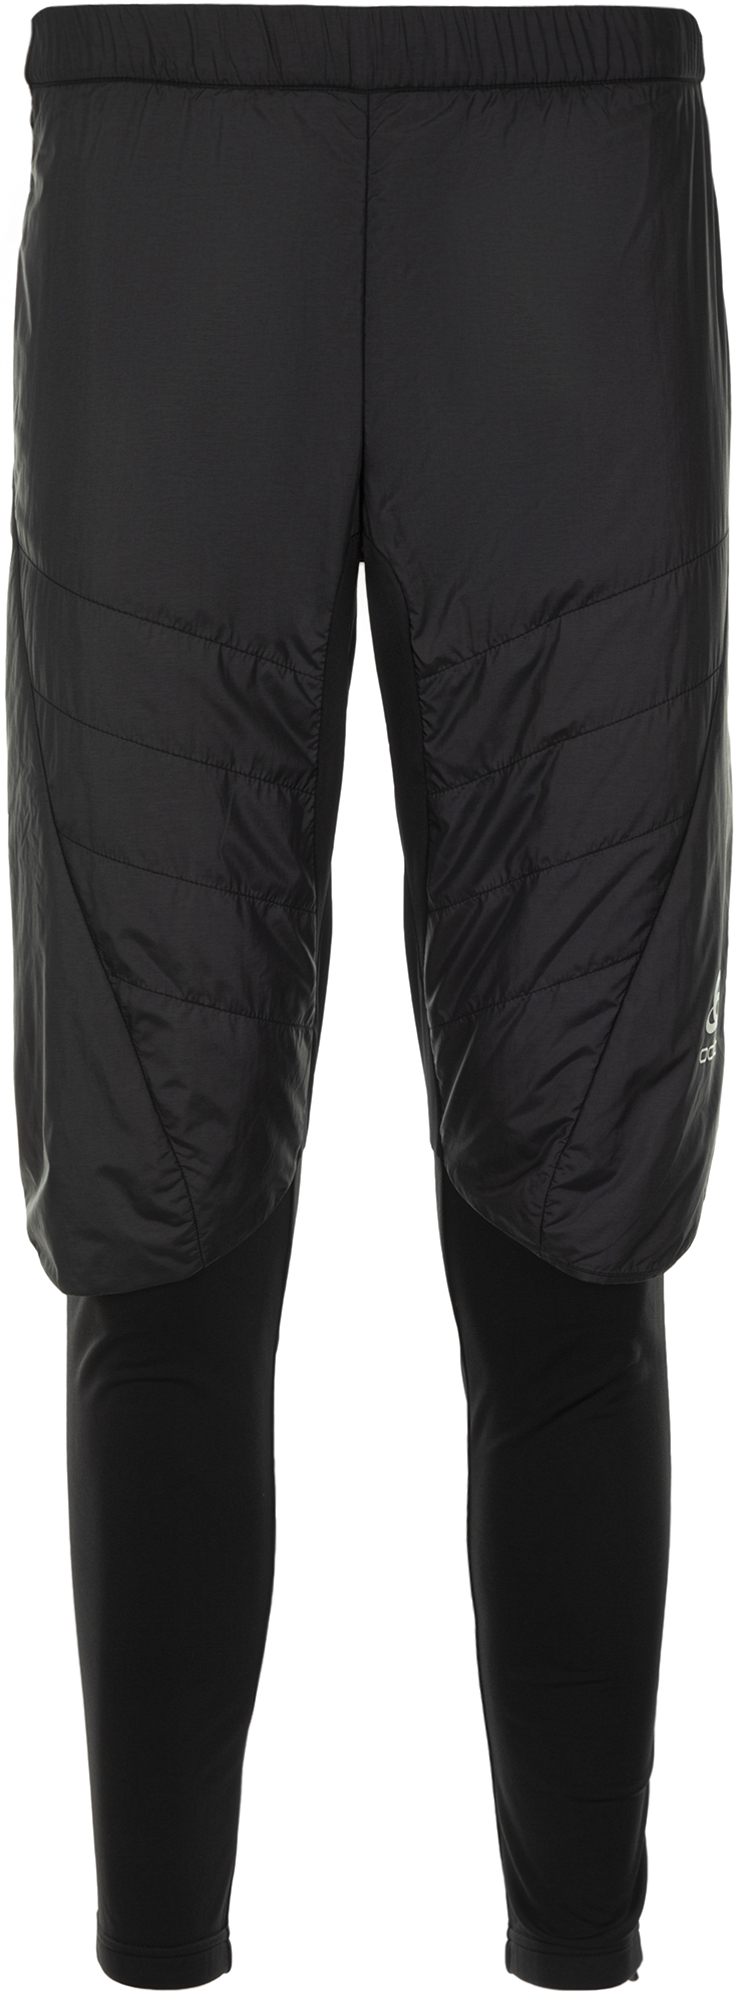 Odlo Брюки утепленные мужские Irbis X-Warm, размер 52-54